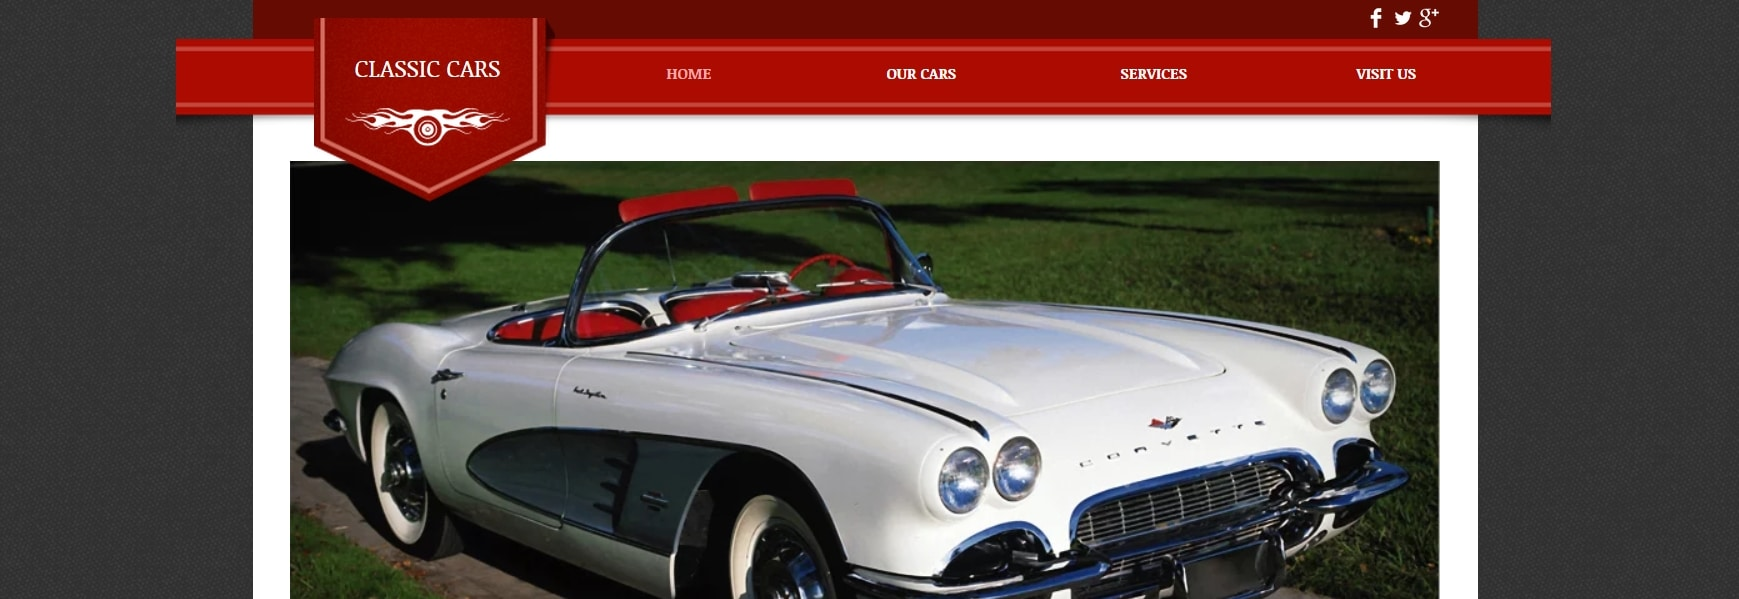 Vintage Cars Website Template _ WIX